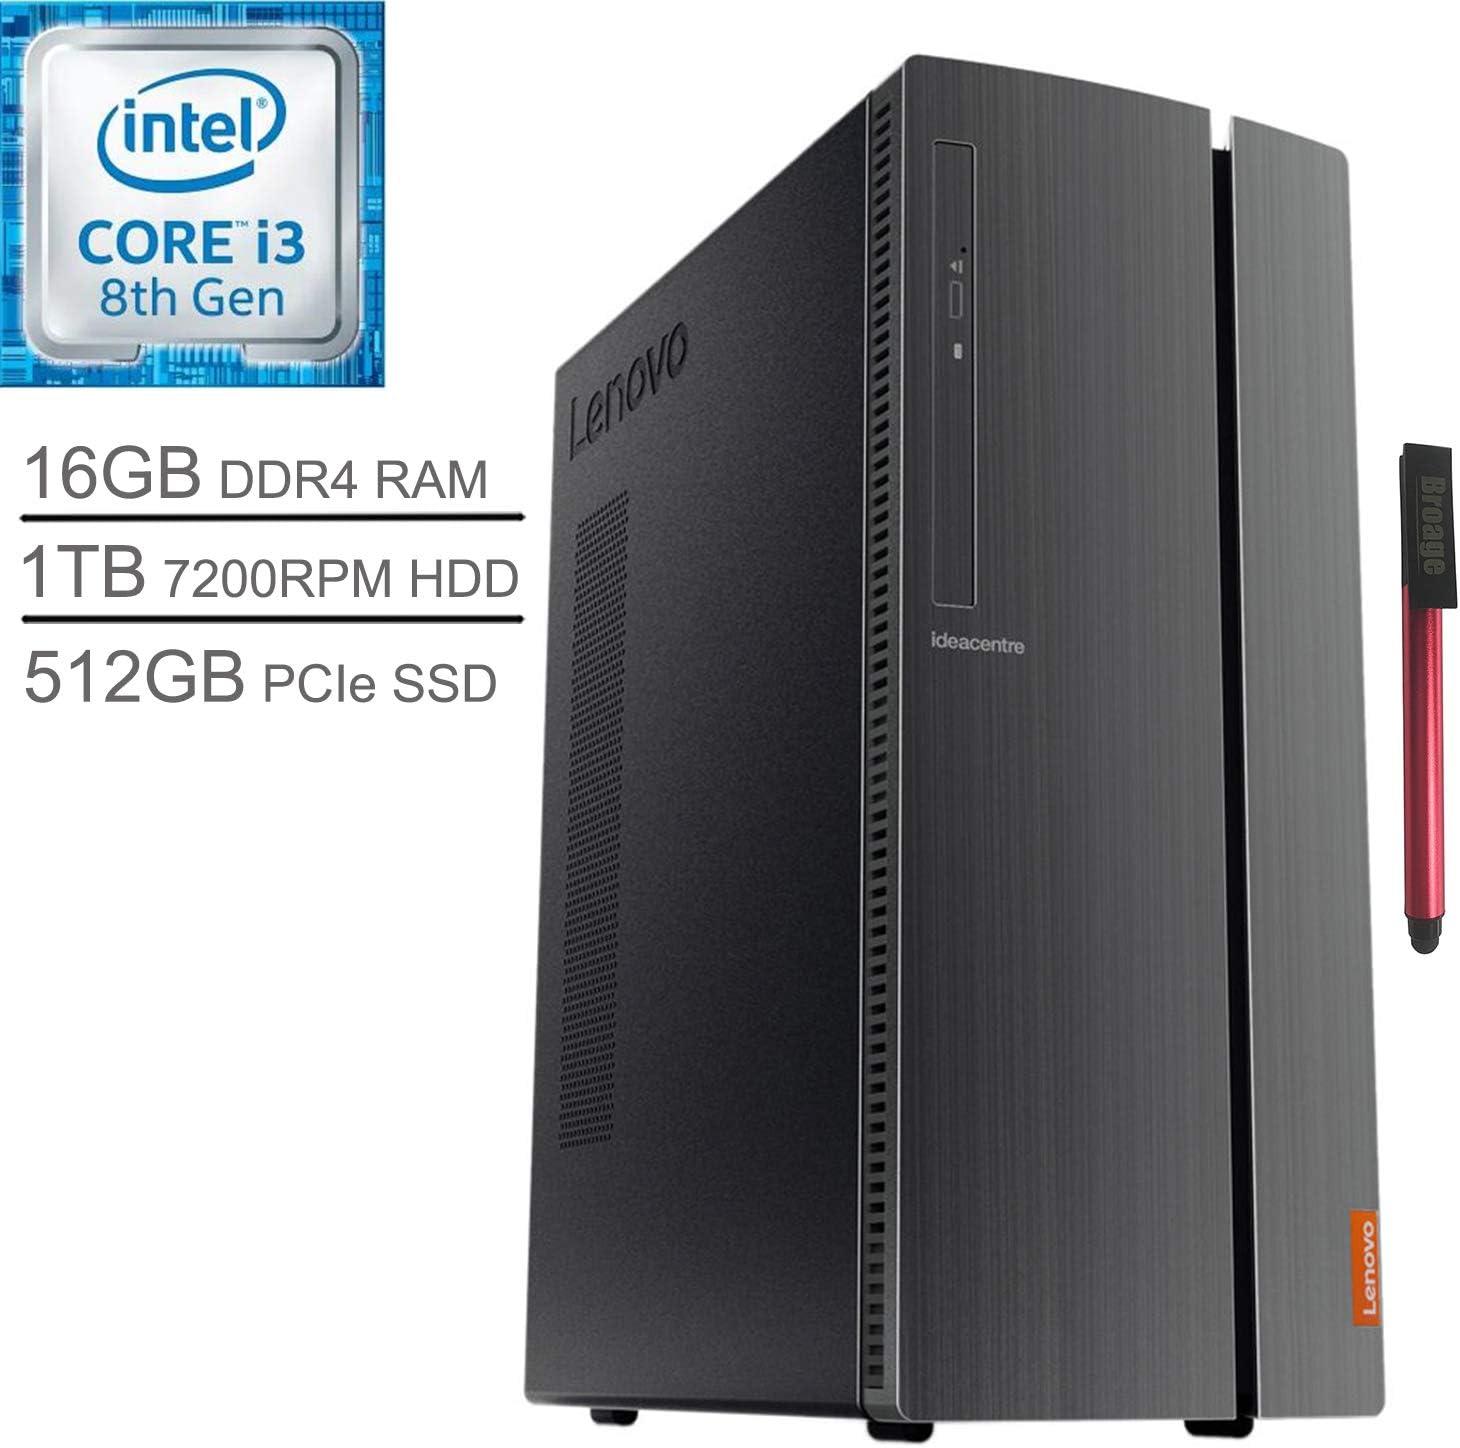 Lenovo IdeaCentre 510A Desktop Computer_ Intel Quad-Core i3-8100 3.6GHz (Beats i5-7500)_ 16GB DDR4 RAM_ 1TB 7200RPM HDD + 512GB PCIe SSD_ DVDRW_ 802.11AC WiFi_ Windows 10_ BROAGE 64GB Flash Drive